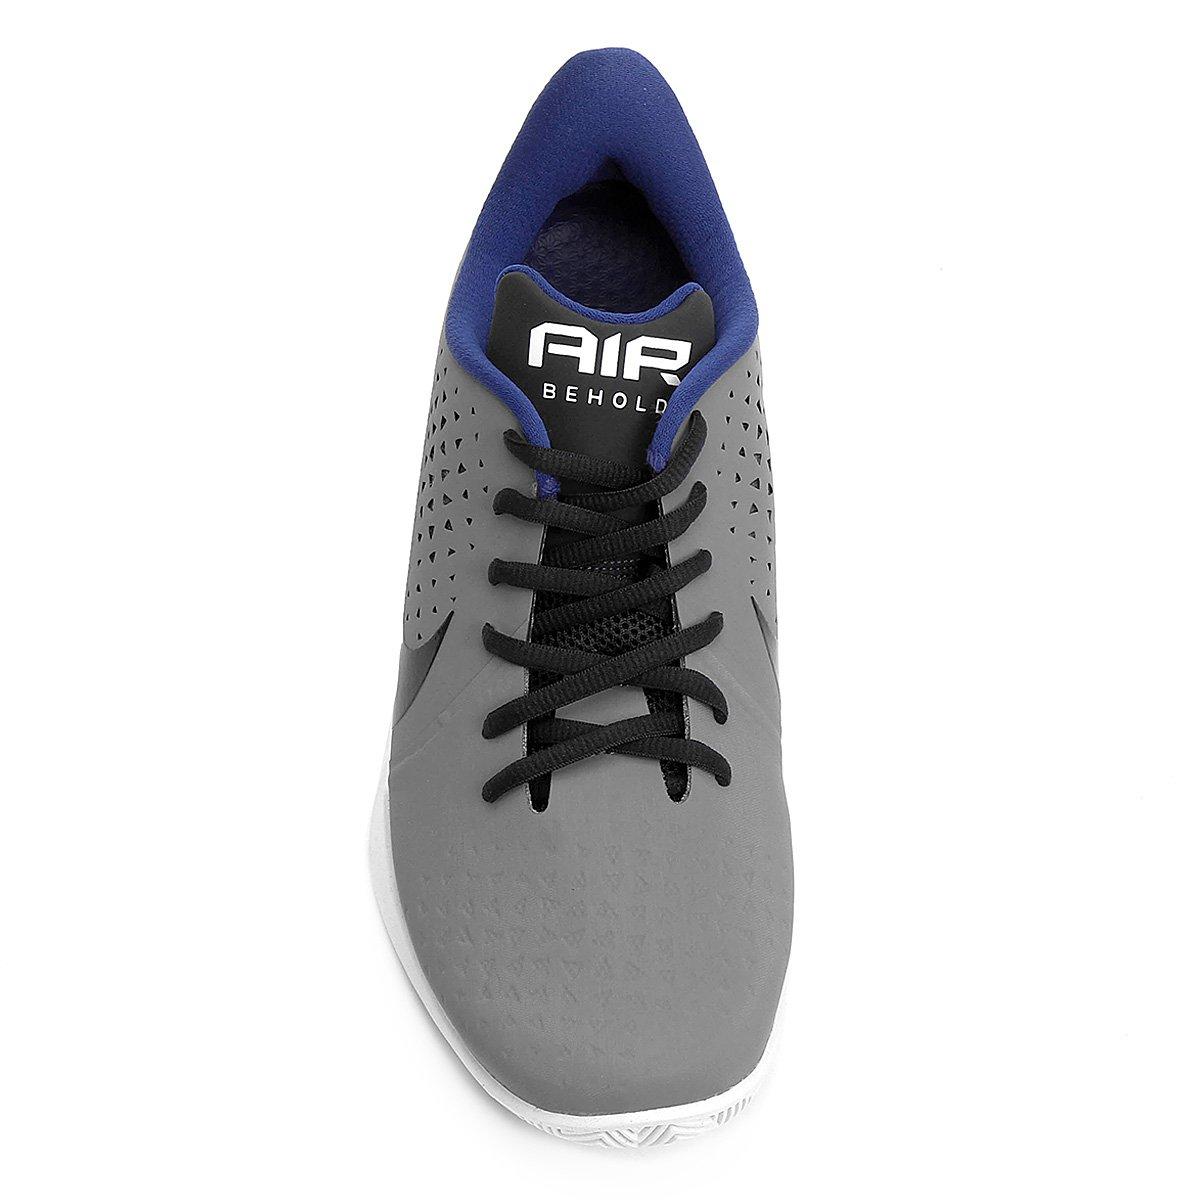 Tênis Nike Air Behold Low Masculino - Cinza e Azul - Compre Agora ... d491f92cc5467